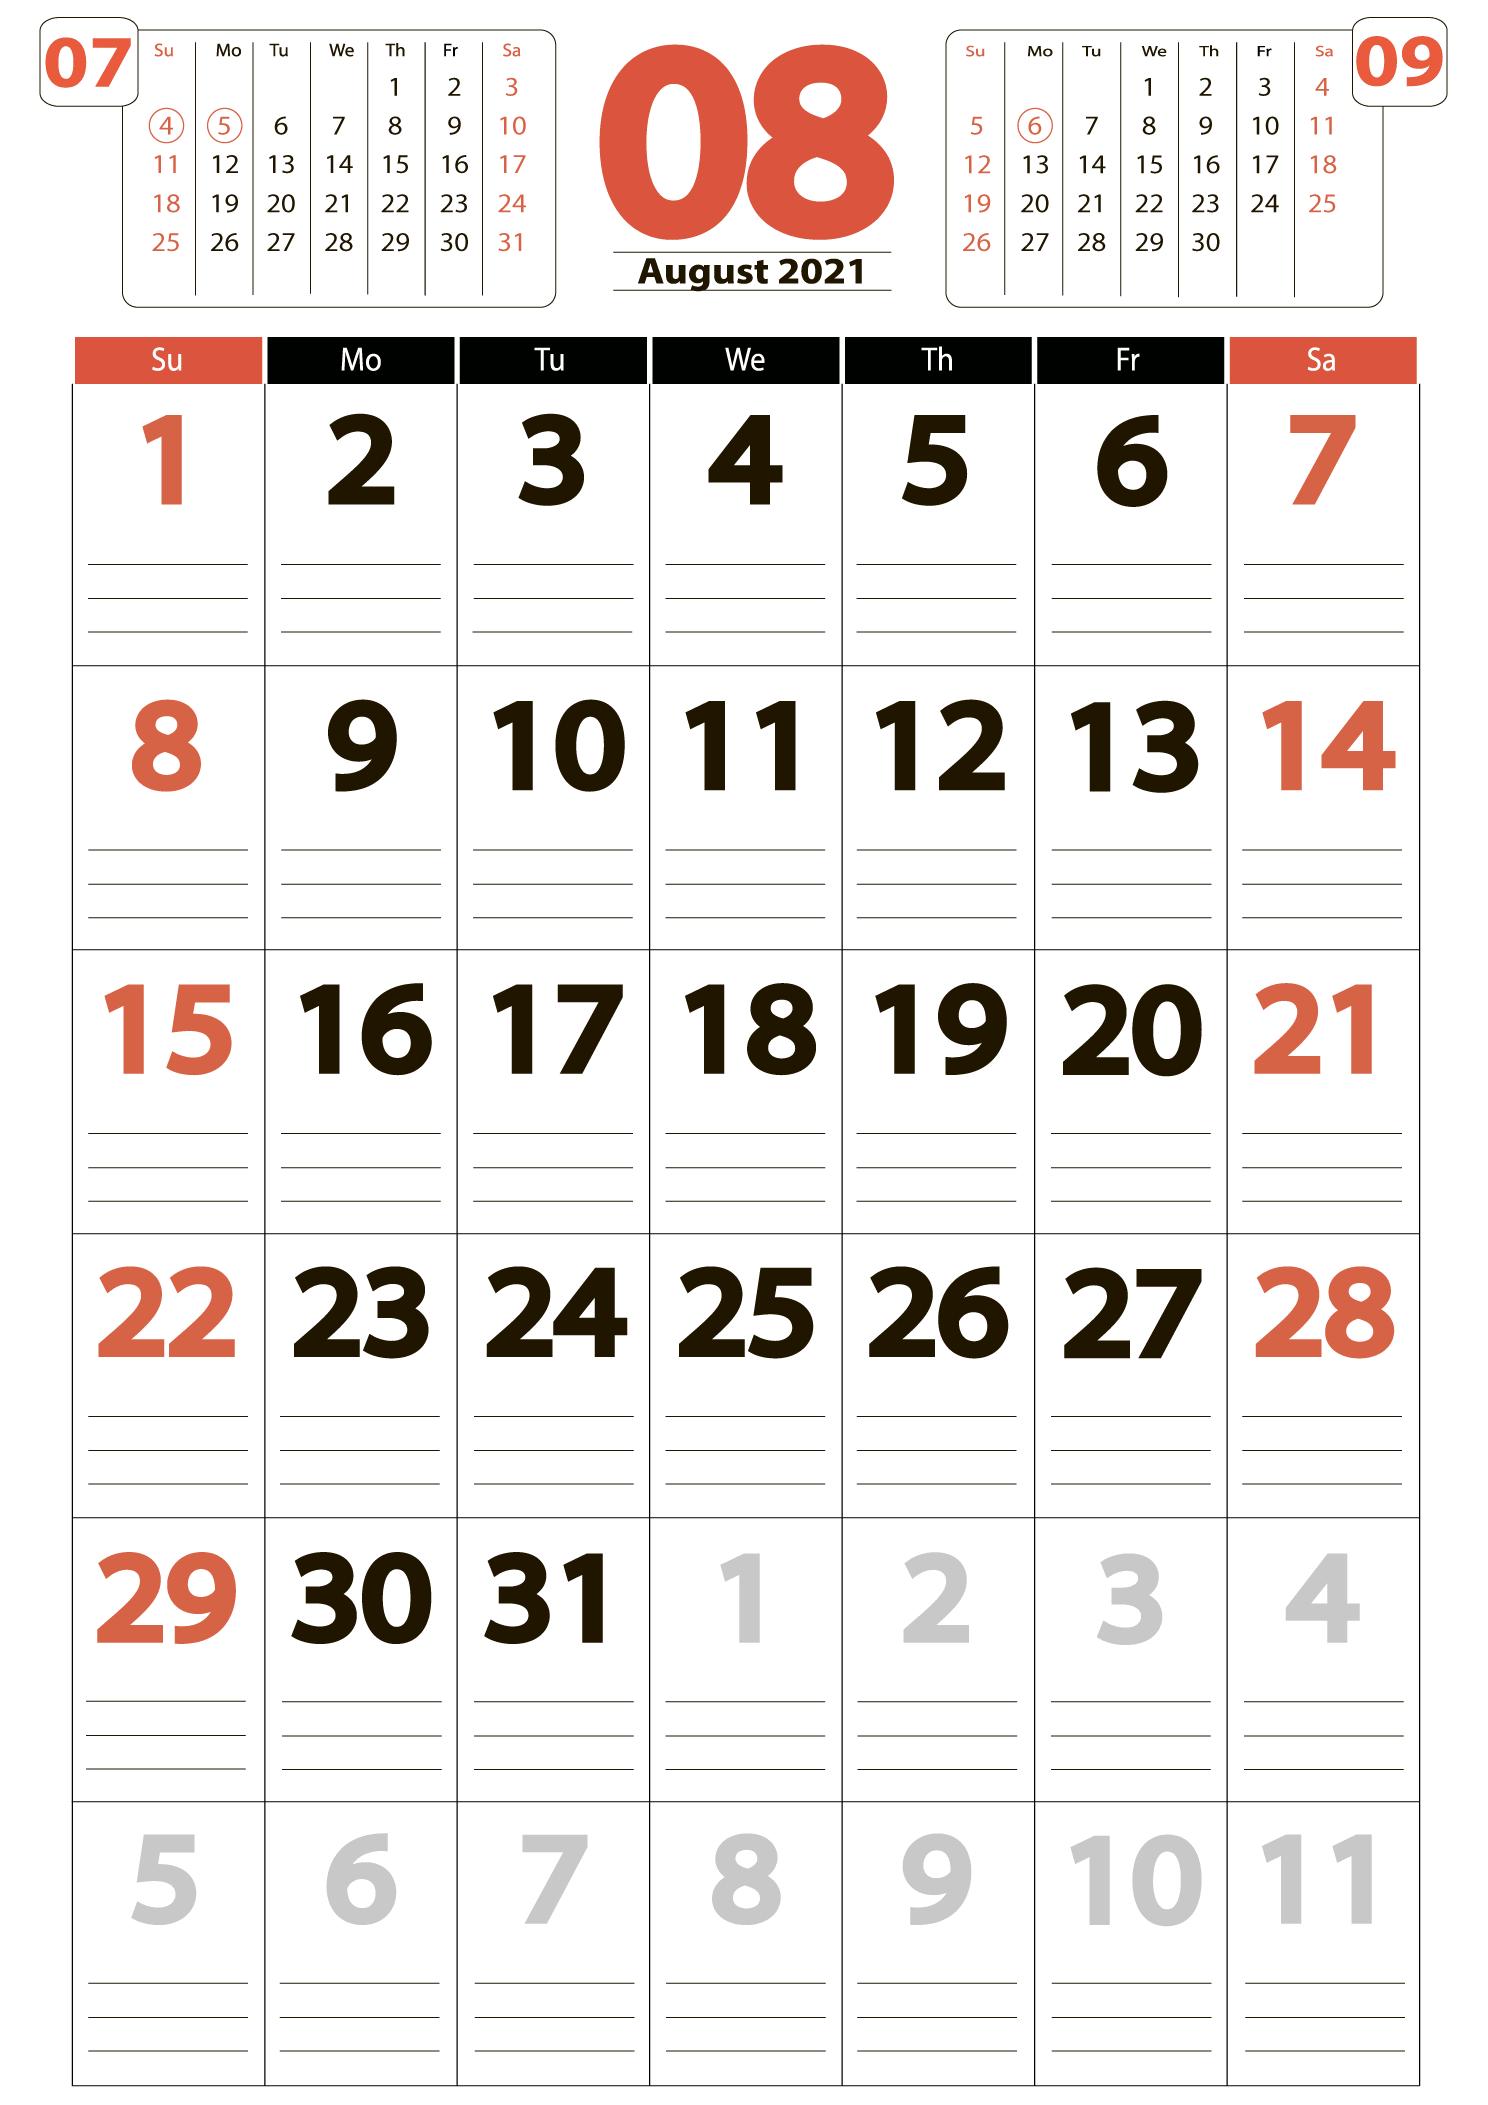 Download calendar 08 2021